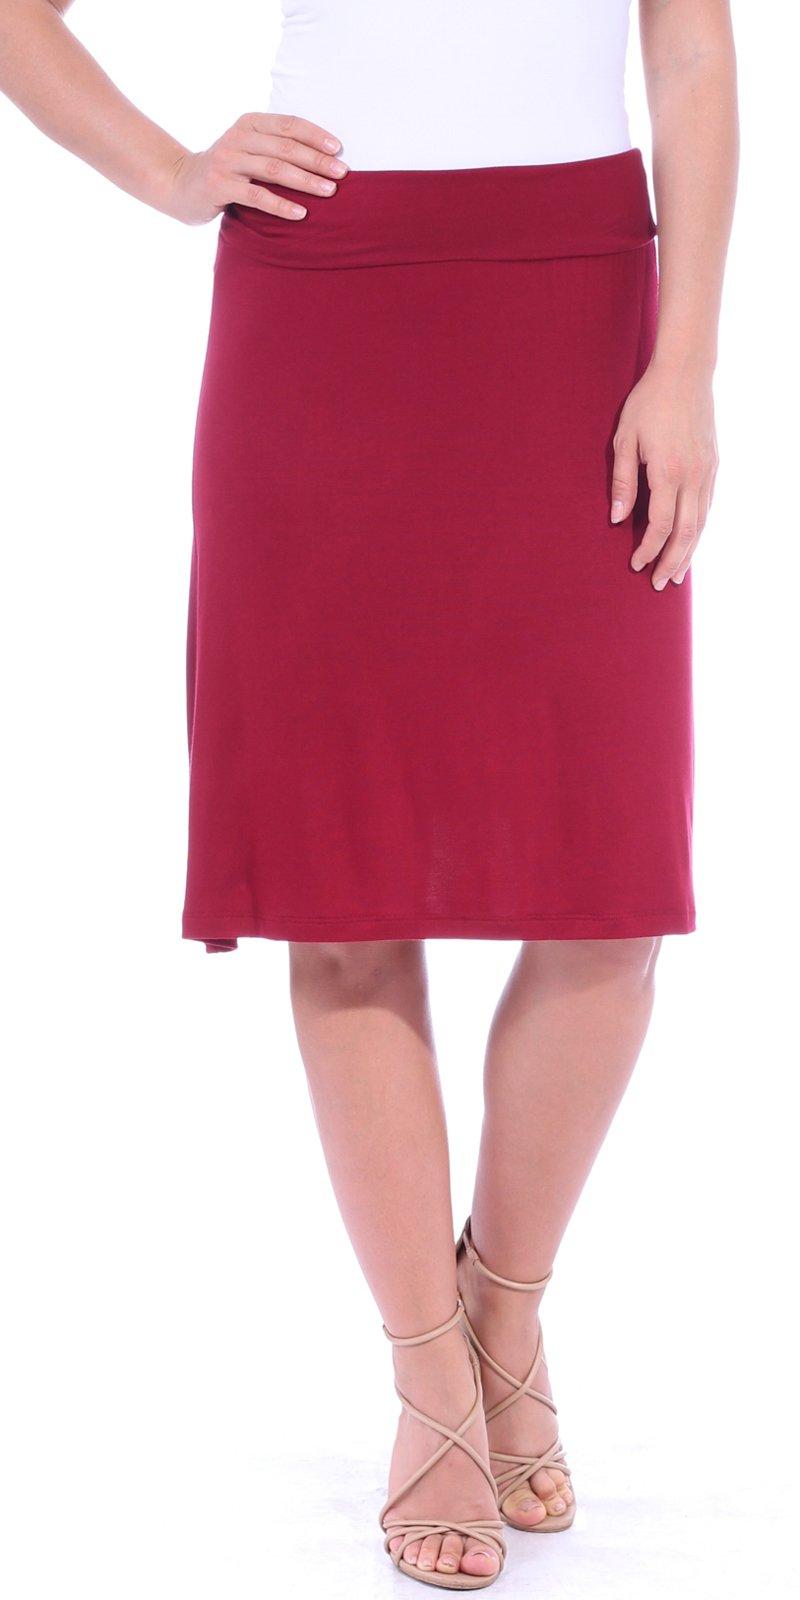 Popana Women's Casual Stretch Midi Knee Length Short Summer Skirt - Made in USA Medium Burgundy